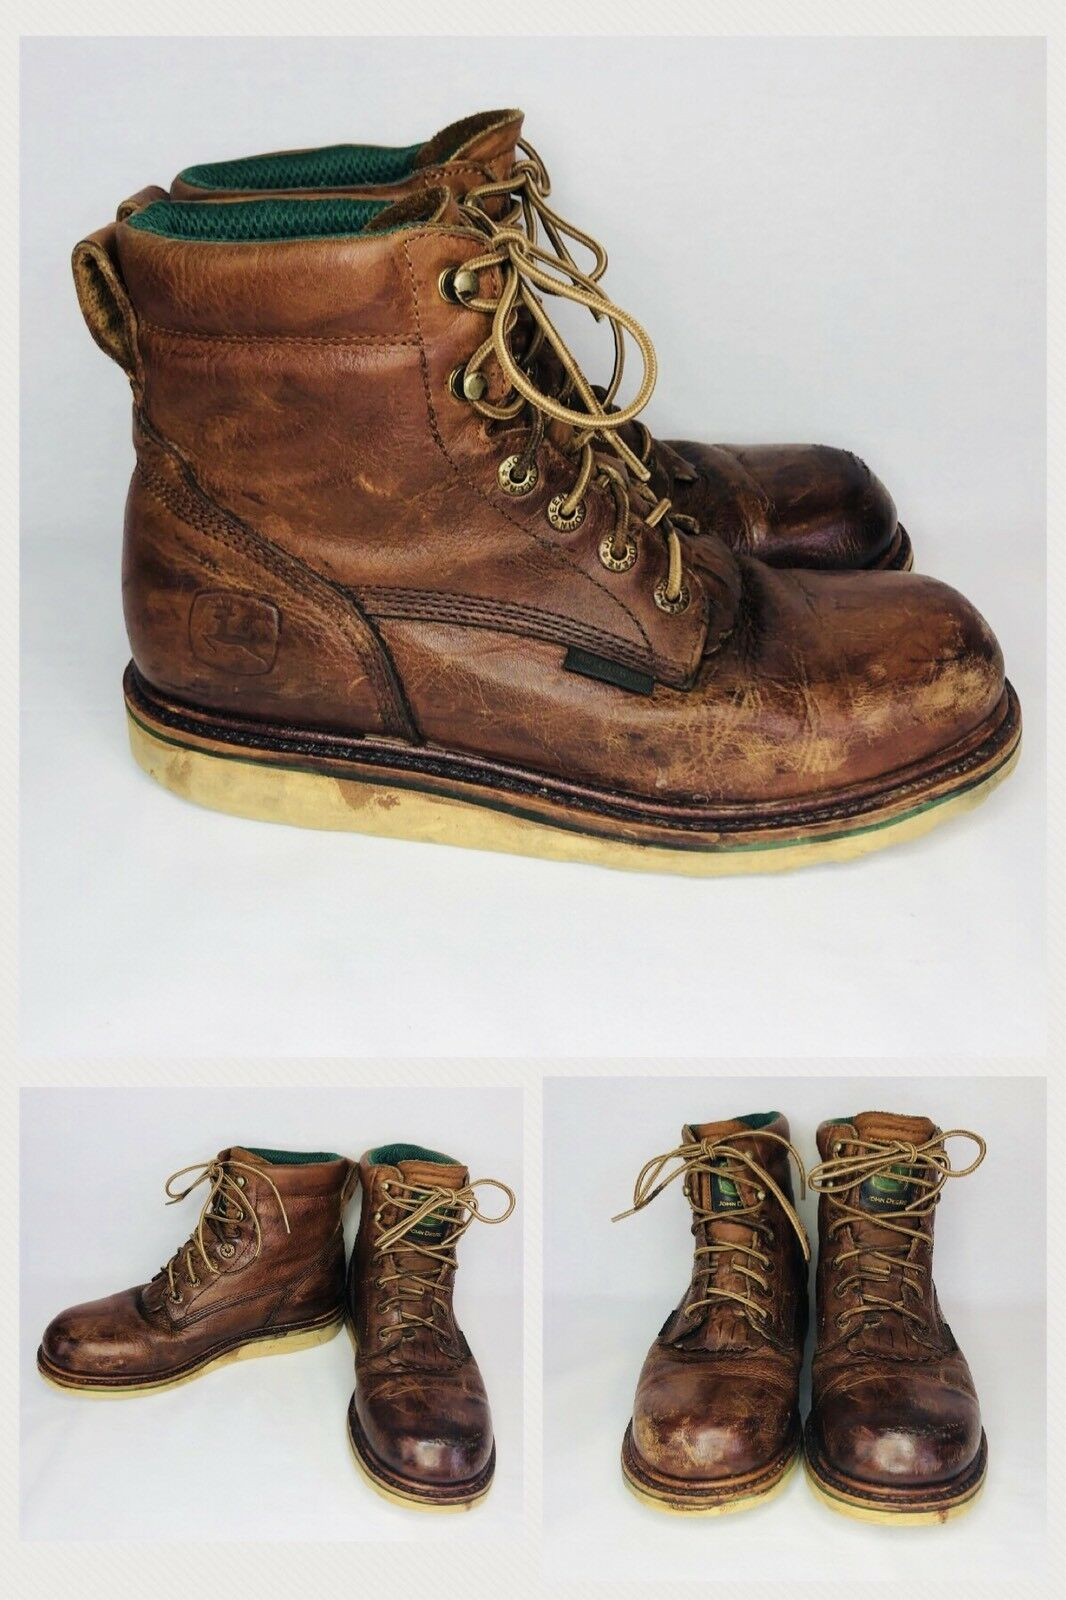 John Deere Men's Waterproof Dan Post Work Boots US Size 12 M Leather JD6102